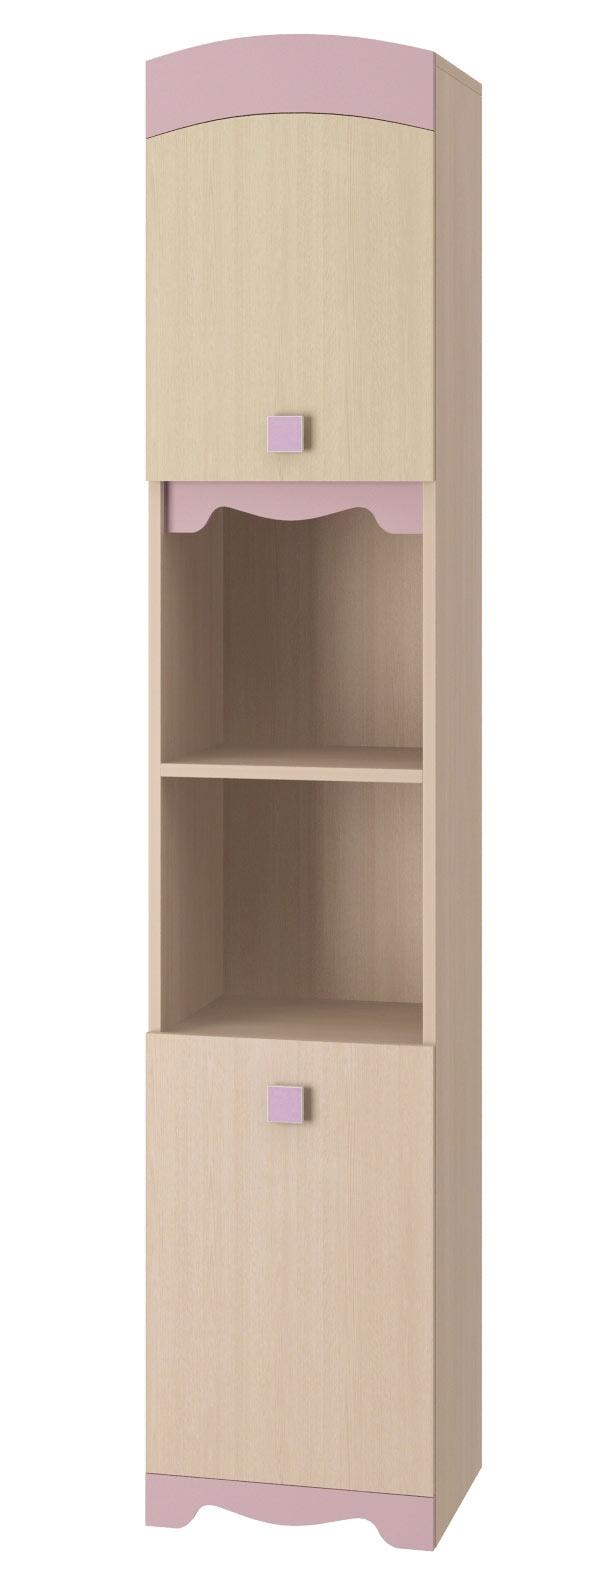 Шкаф-пенал для книг Интеди Pink, ИД.01.142a